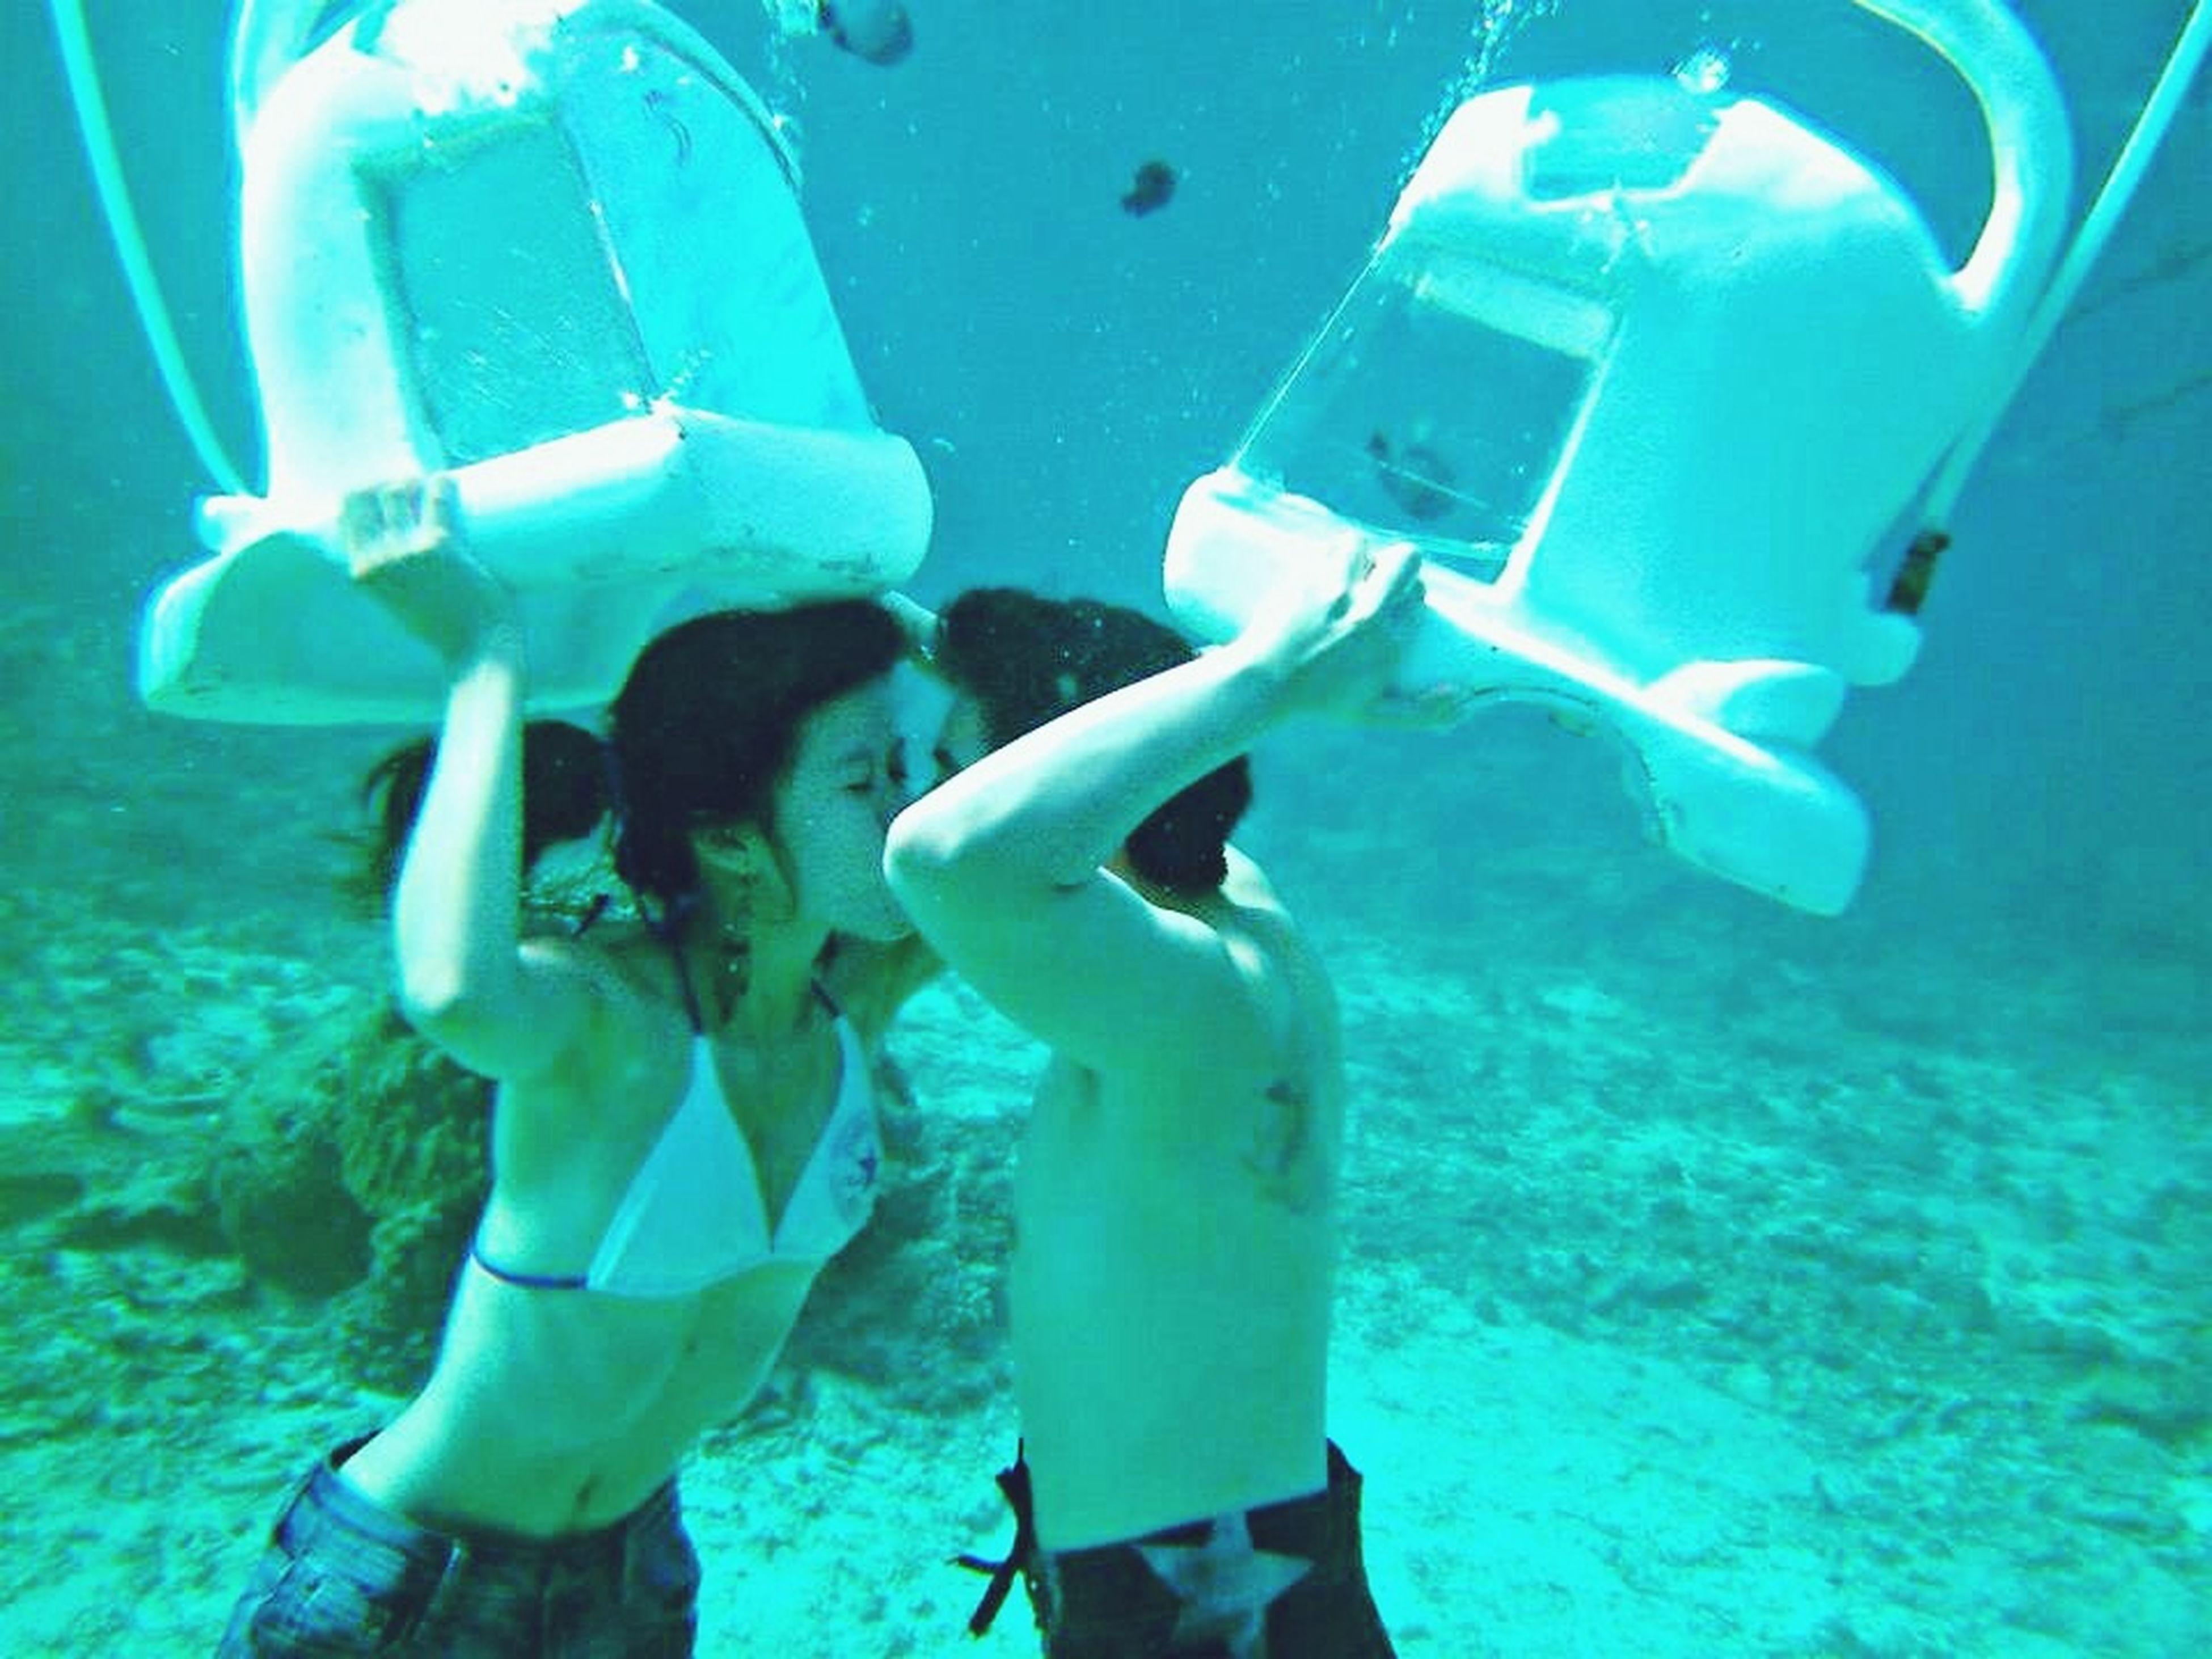 blue, underwater, undersea, sea, swimming, water, sea life, transportation, fish, leisure activity, men, animal themes, lifestyles, mode of transport, adventure, travel, scuba diving, full length